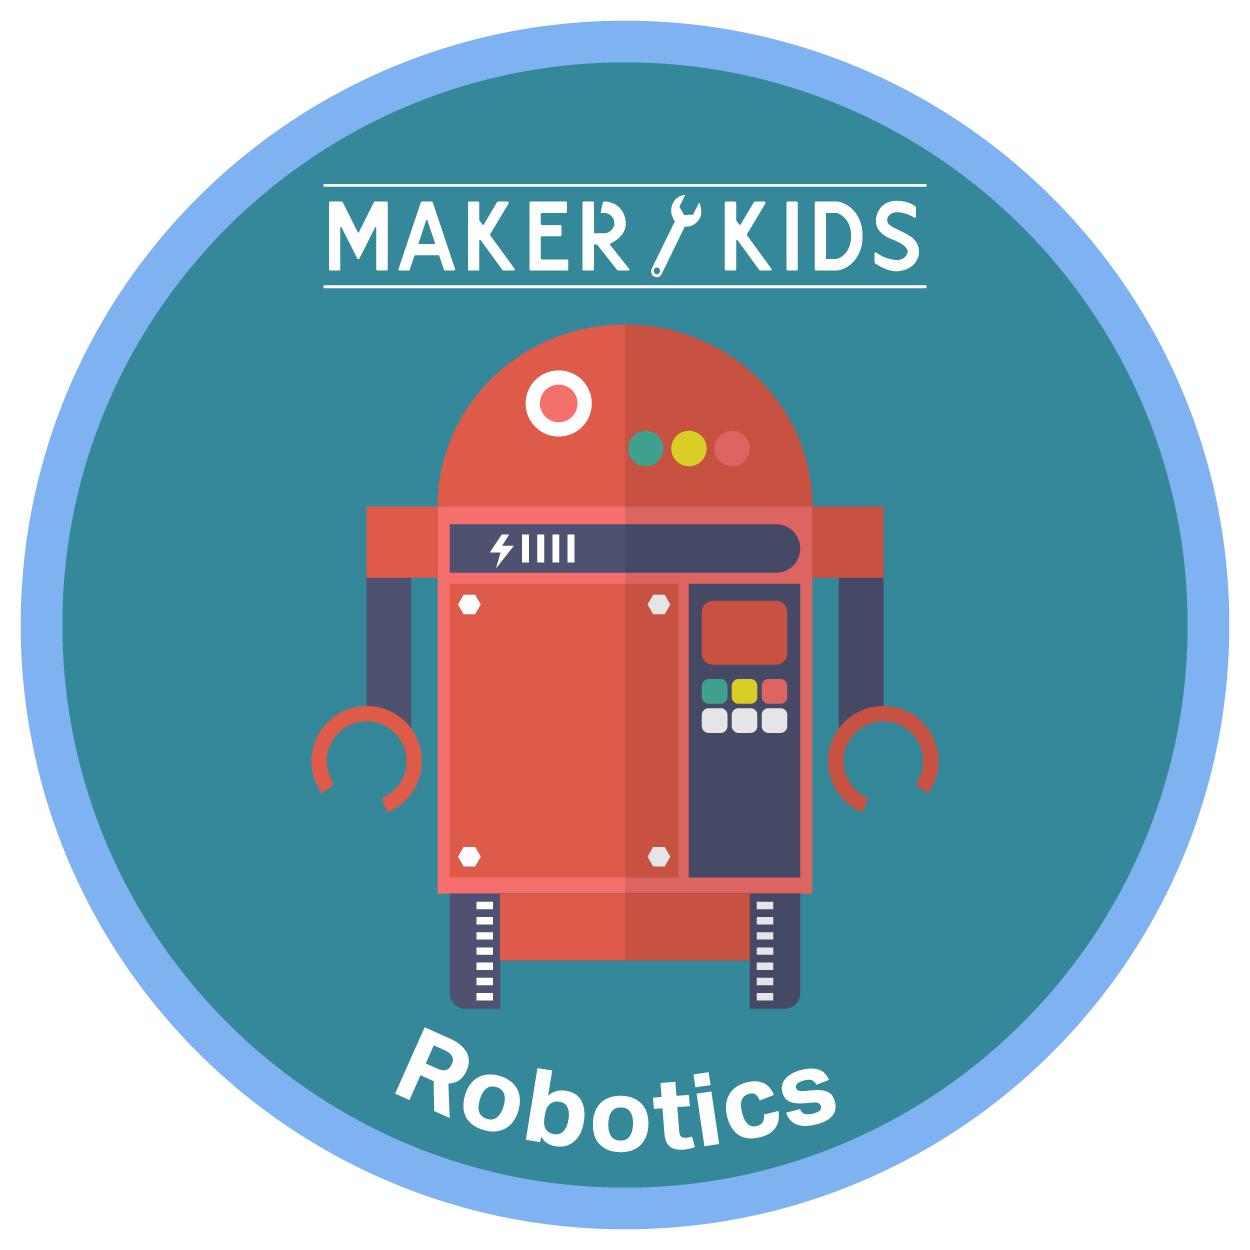 MakerKids Robotics